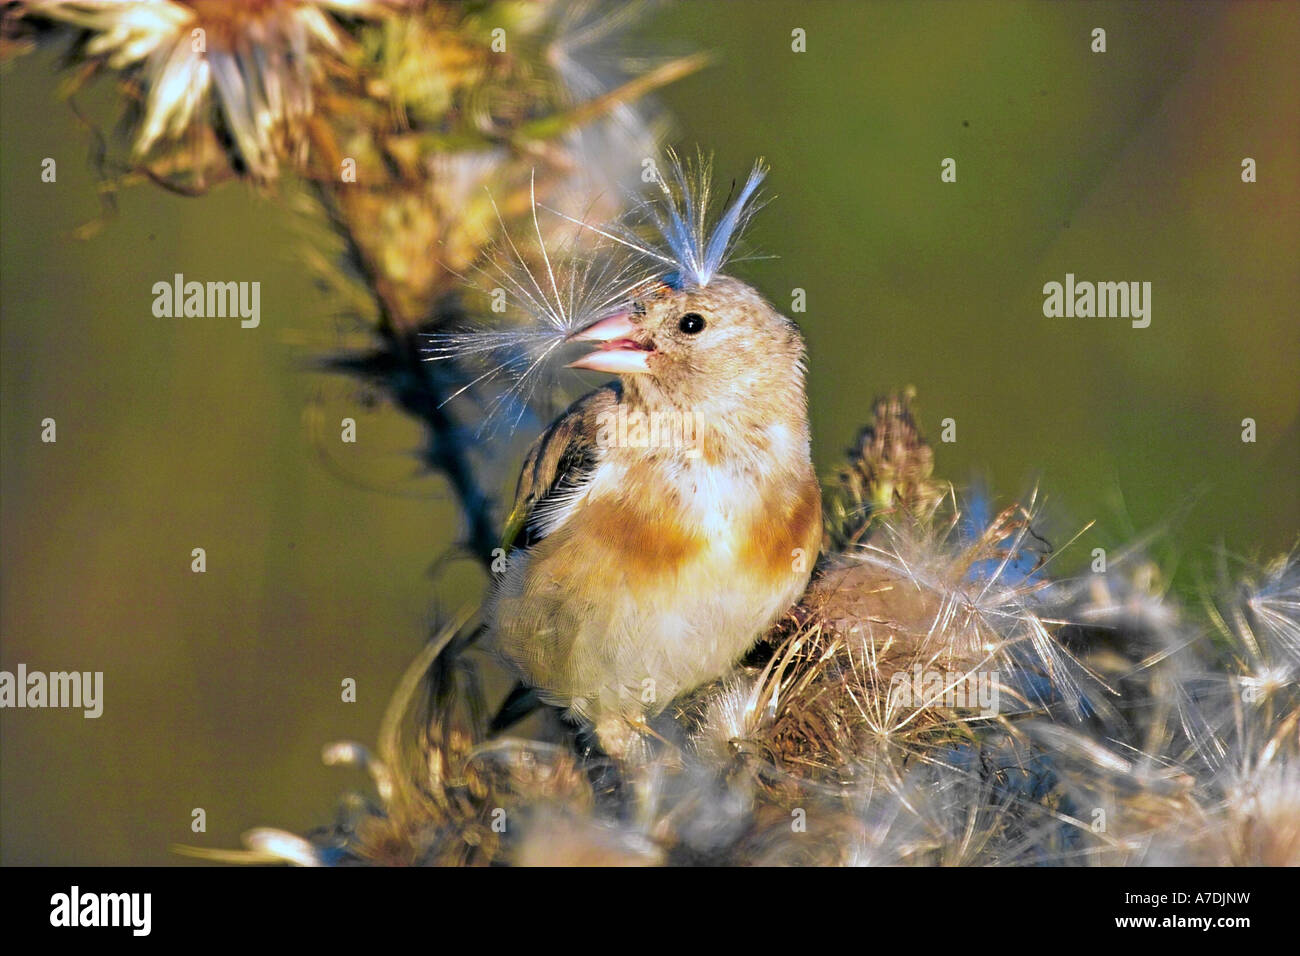 Stieglitz Distelfink europa europe European Goldfinch Carduelis carduelis - Stock Image